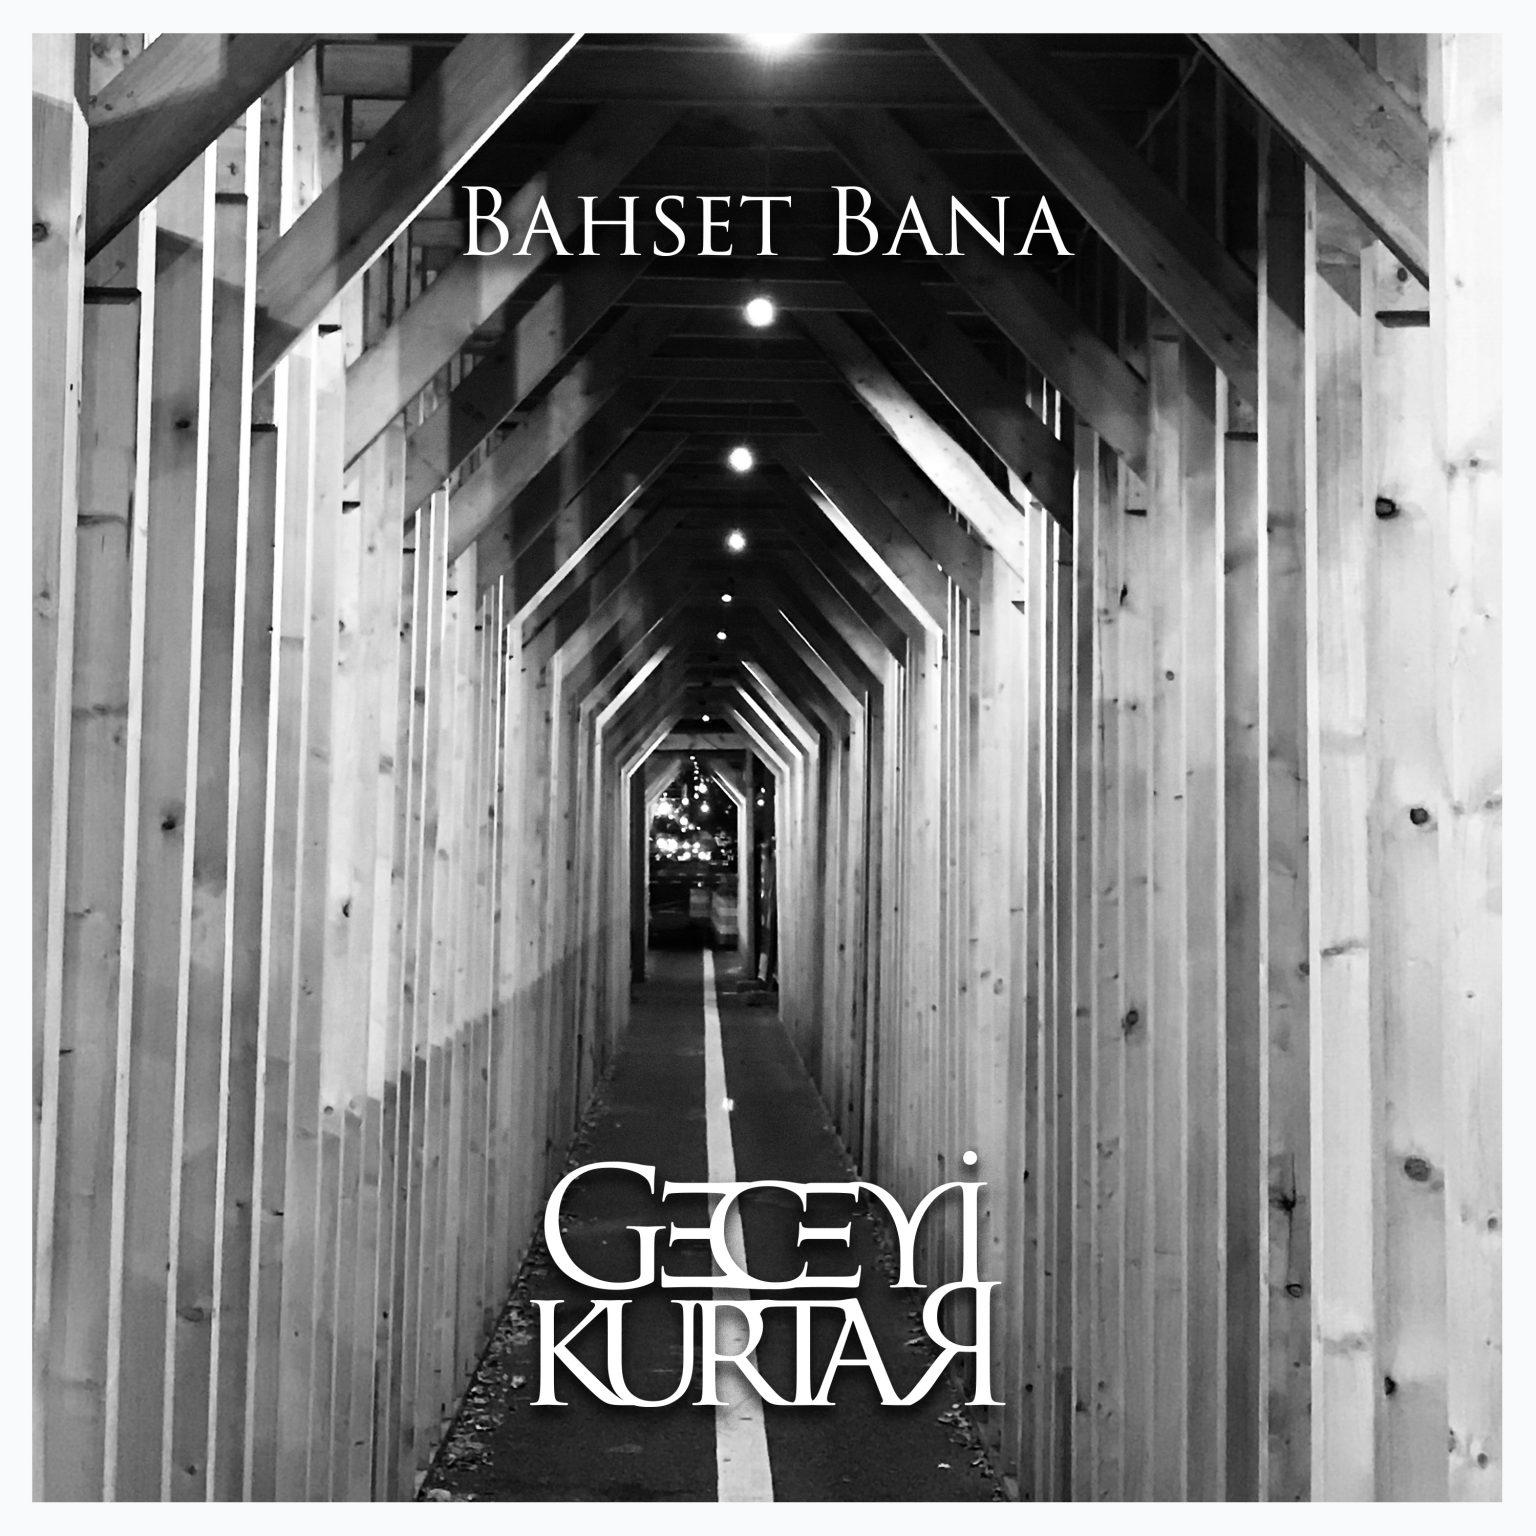 bahset-bana-artwork-1536×1536